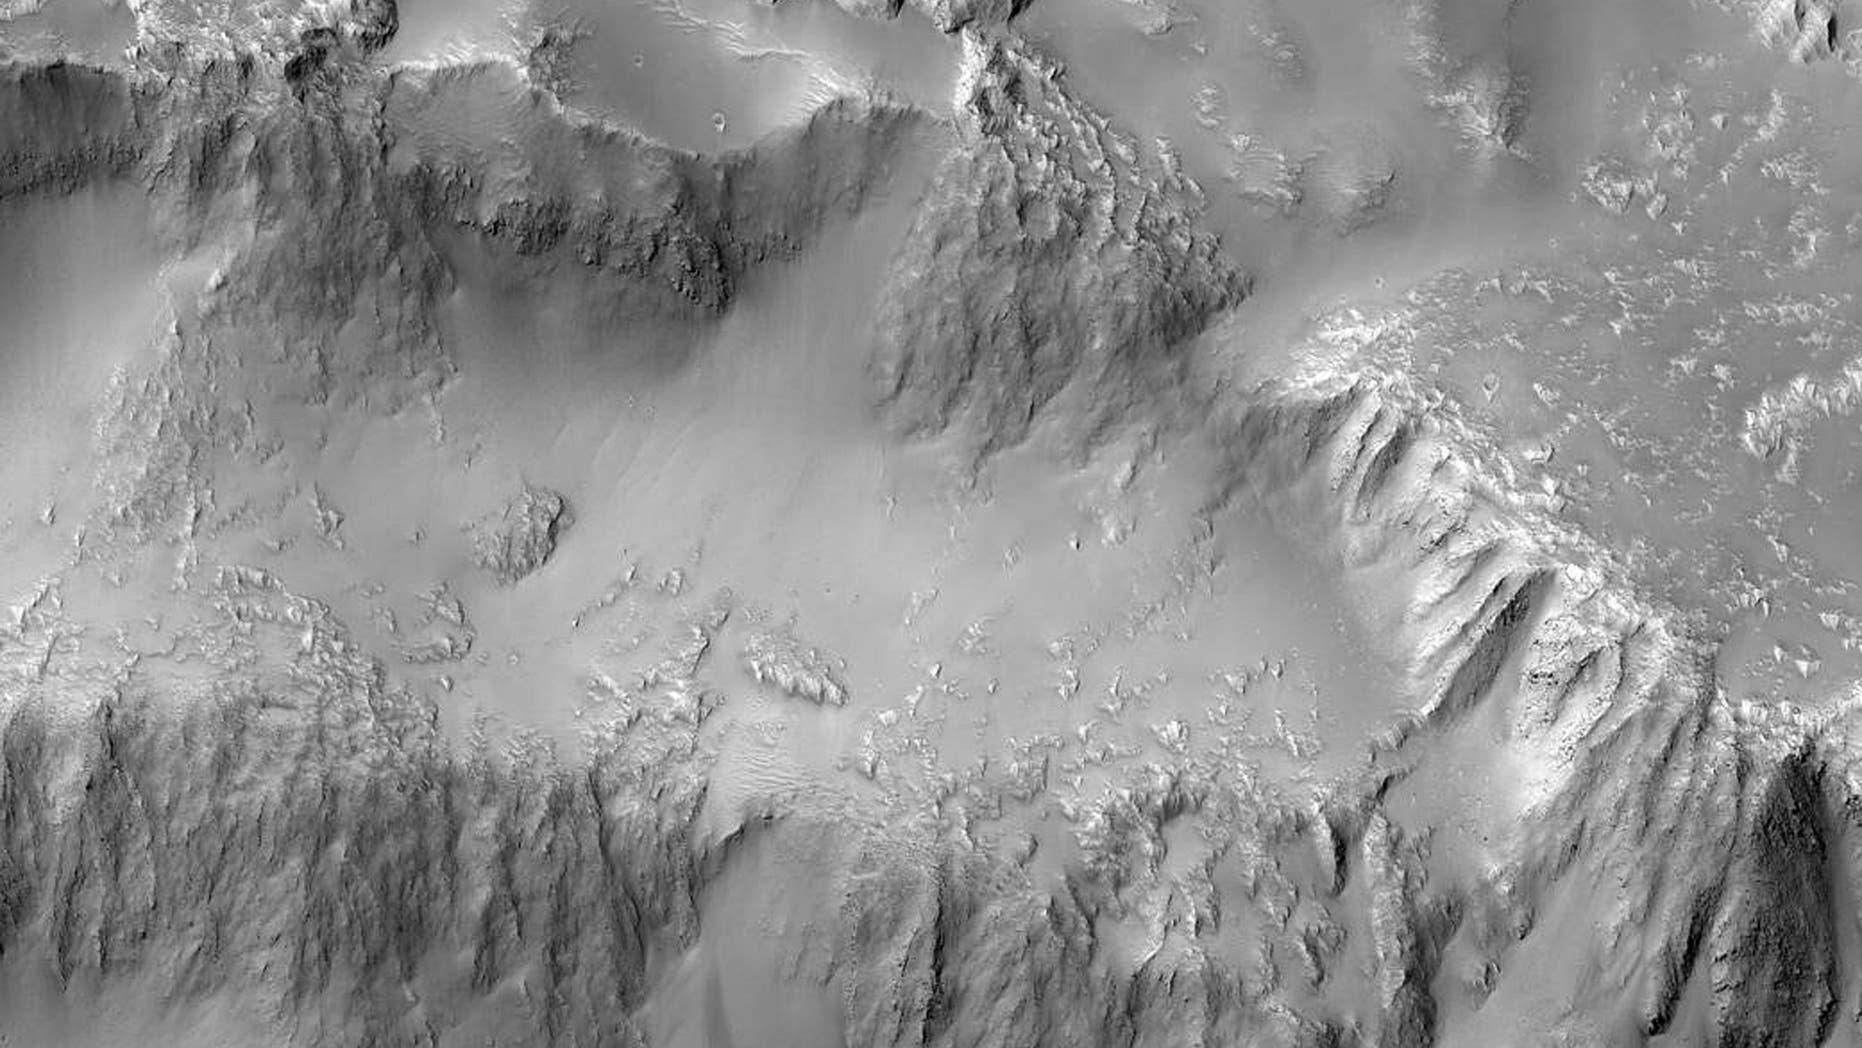 (Image credit: NASA/JPL-Caltech/Univ. of Arizona)